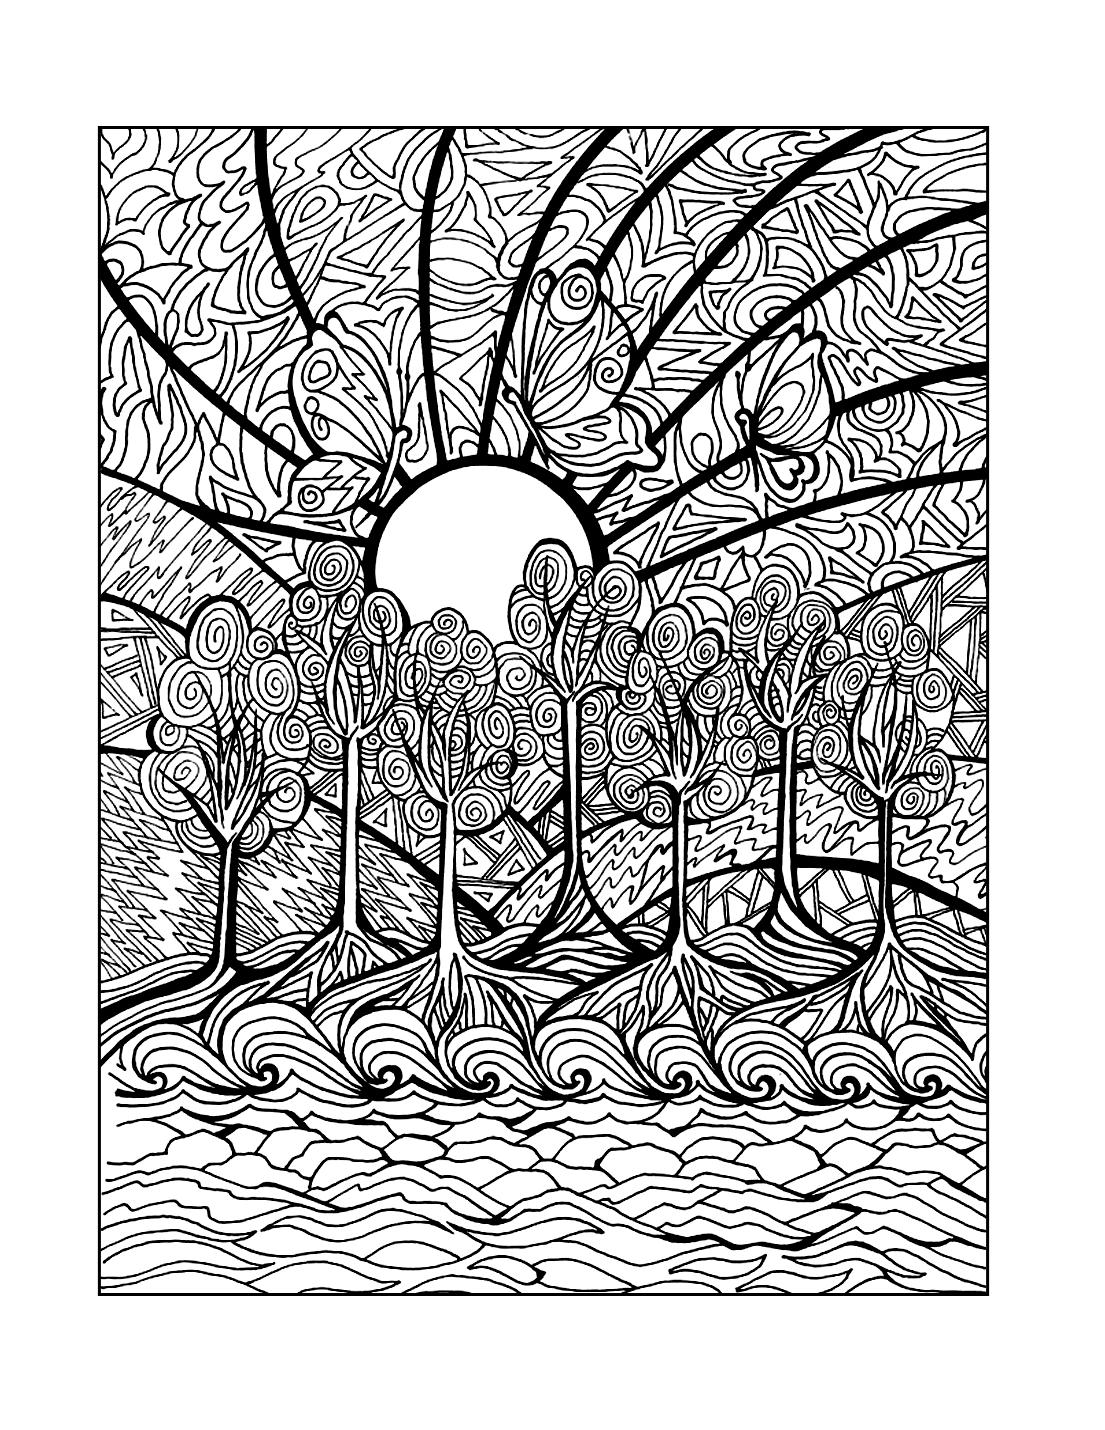 Mosaic Landscape Scene Coloring Page